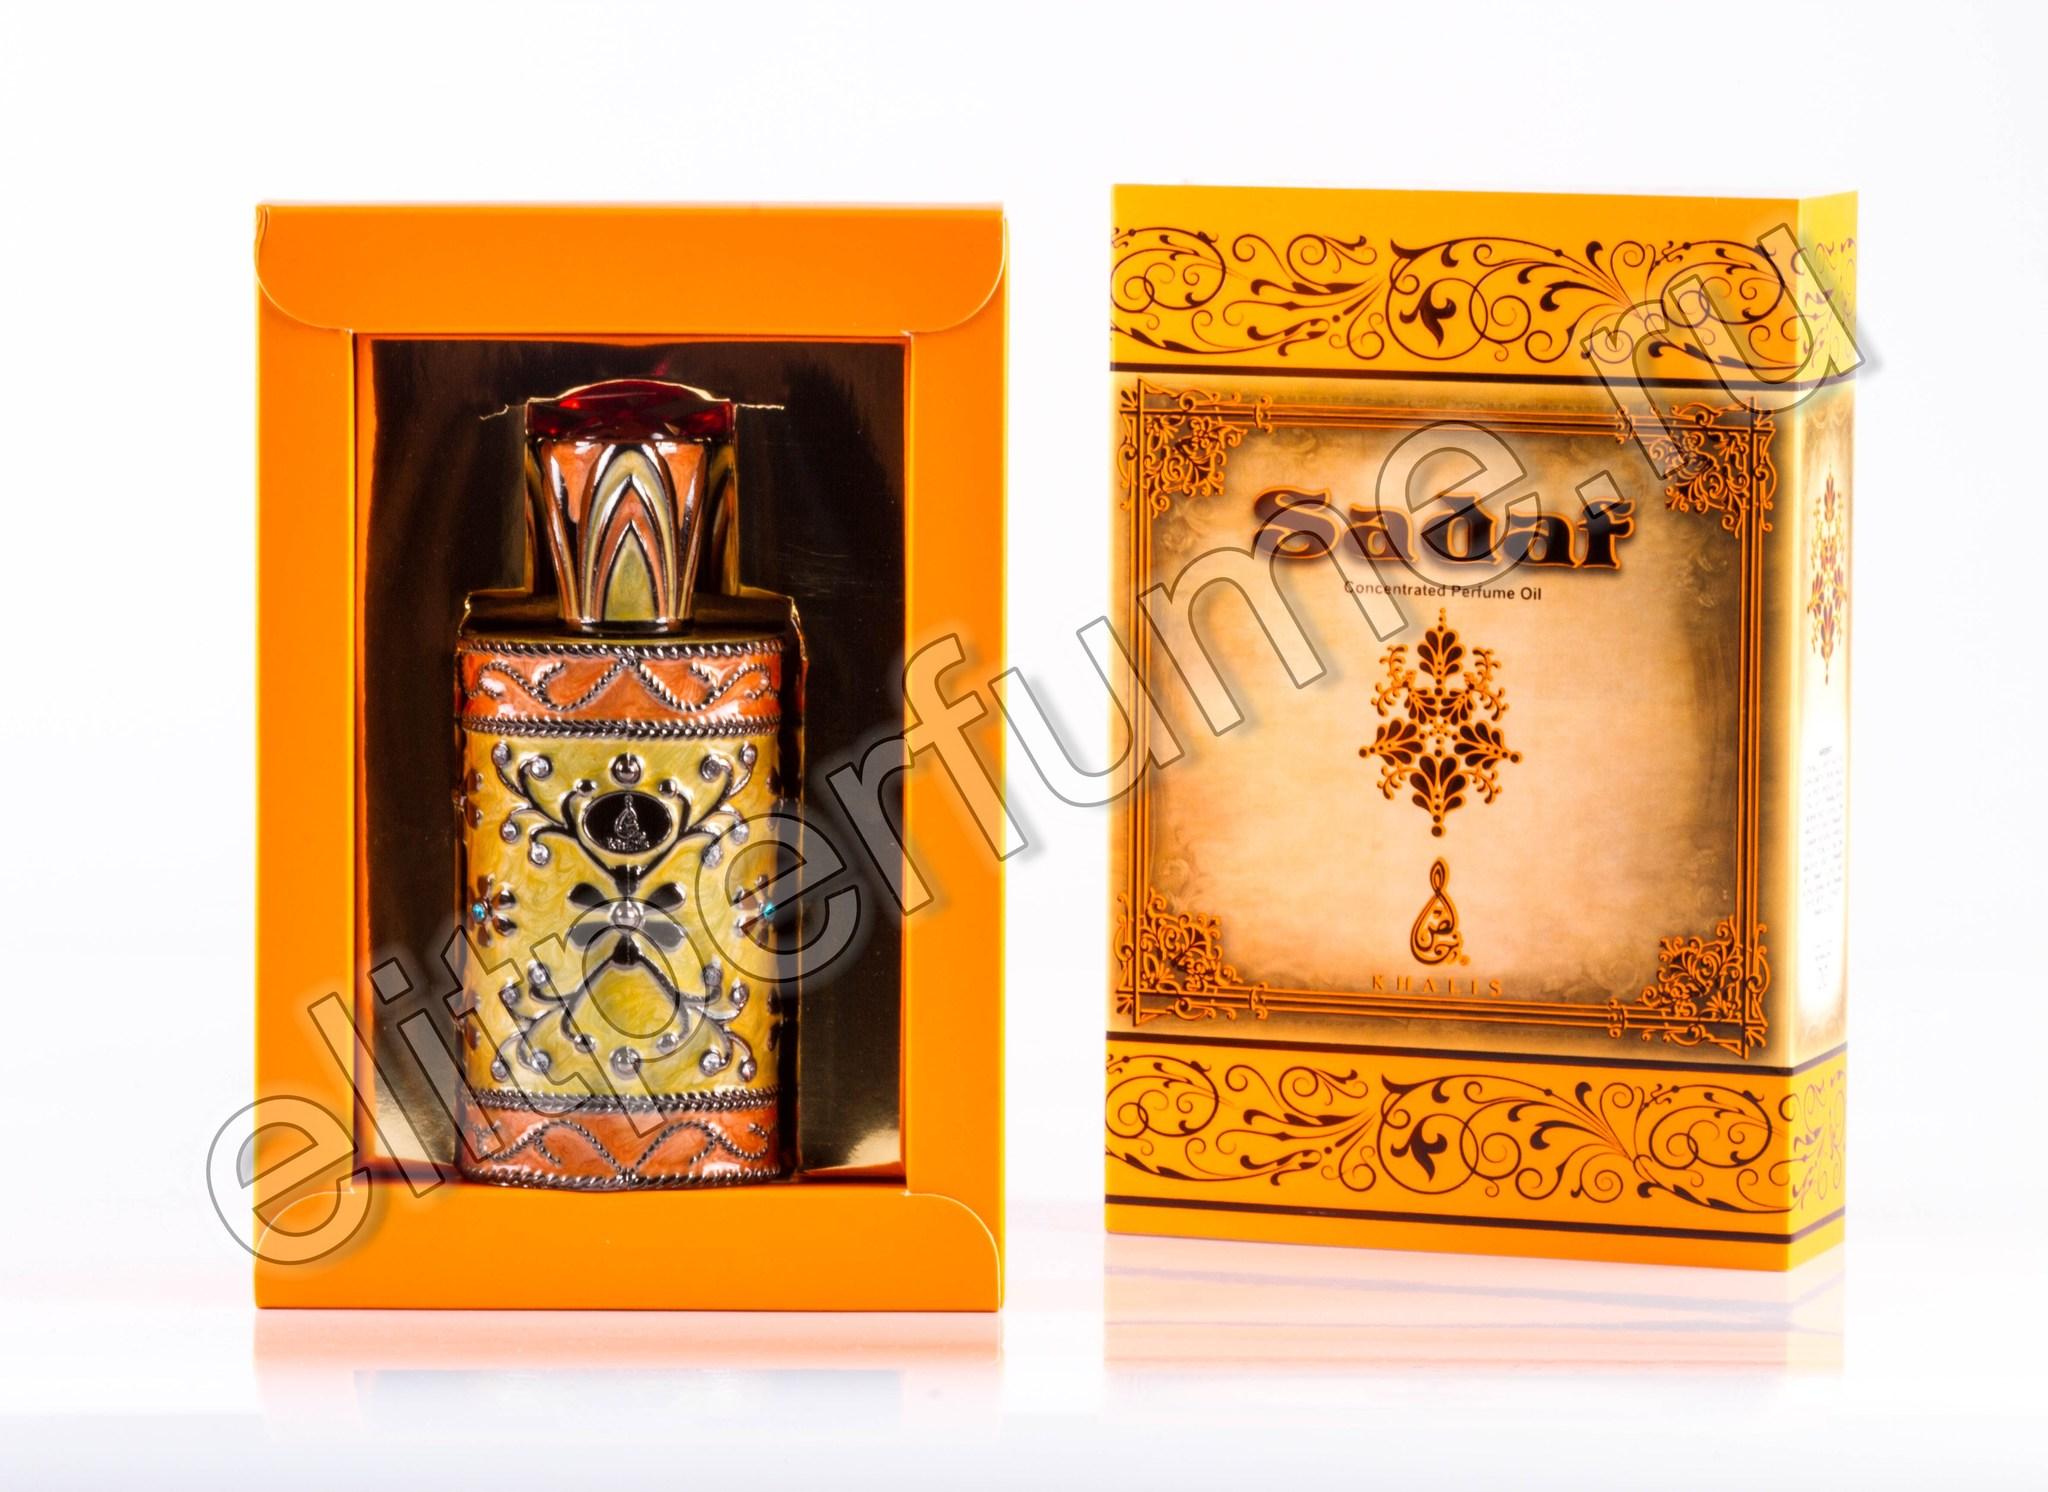 Sadaf Садаф 18 мл Унисекс арабские масляные духи от Халис Khalis Perfumes